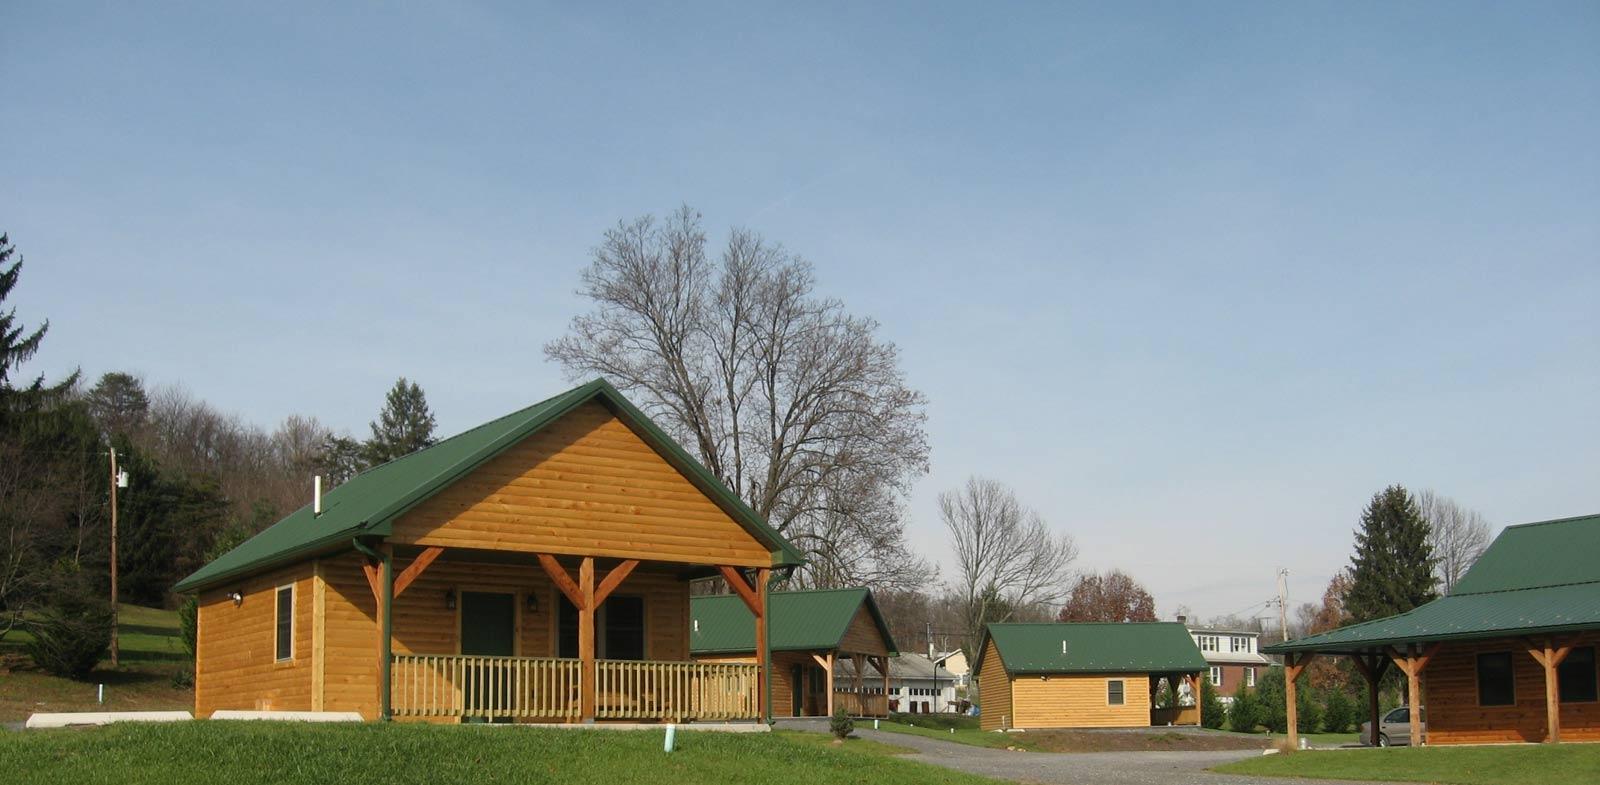 Three cabin exteriors